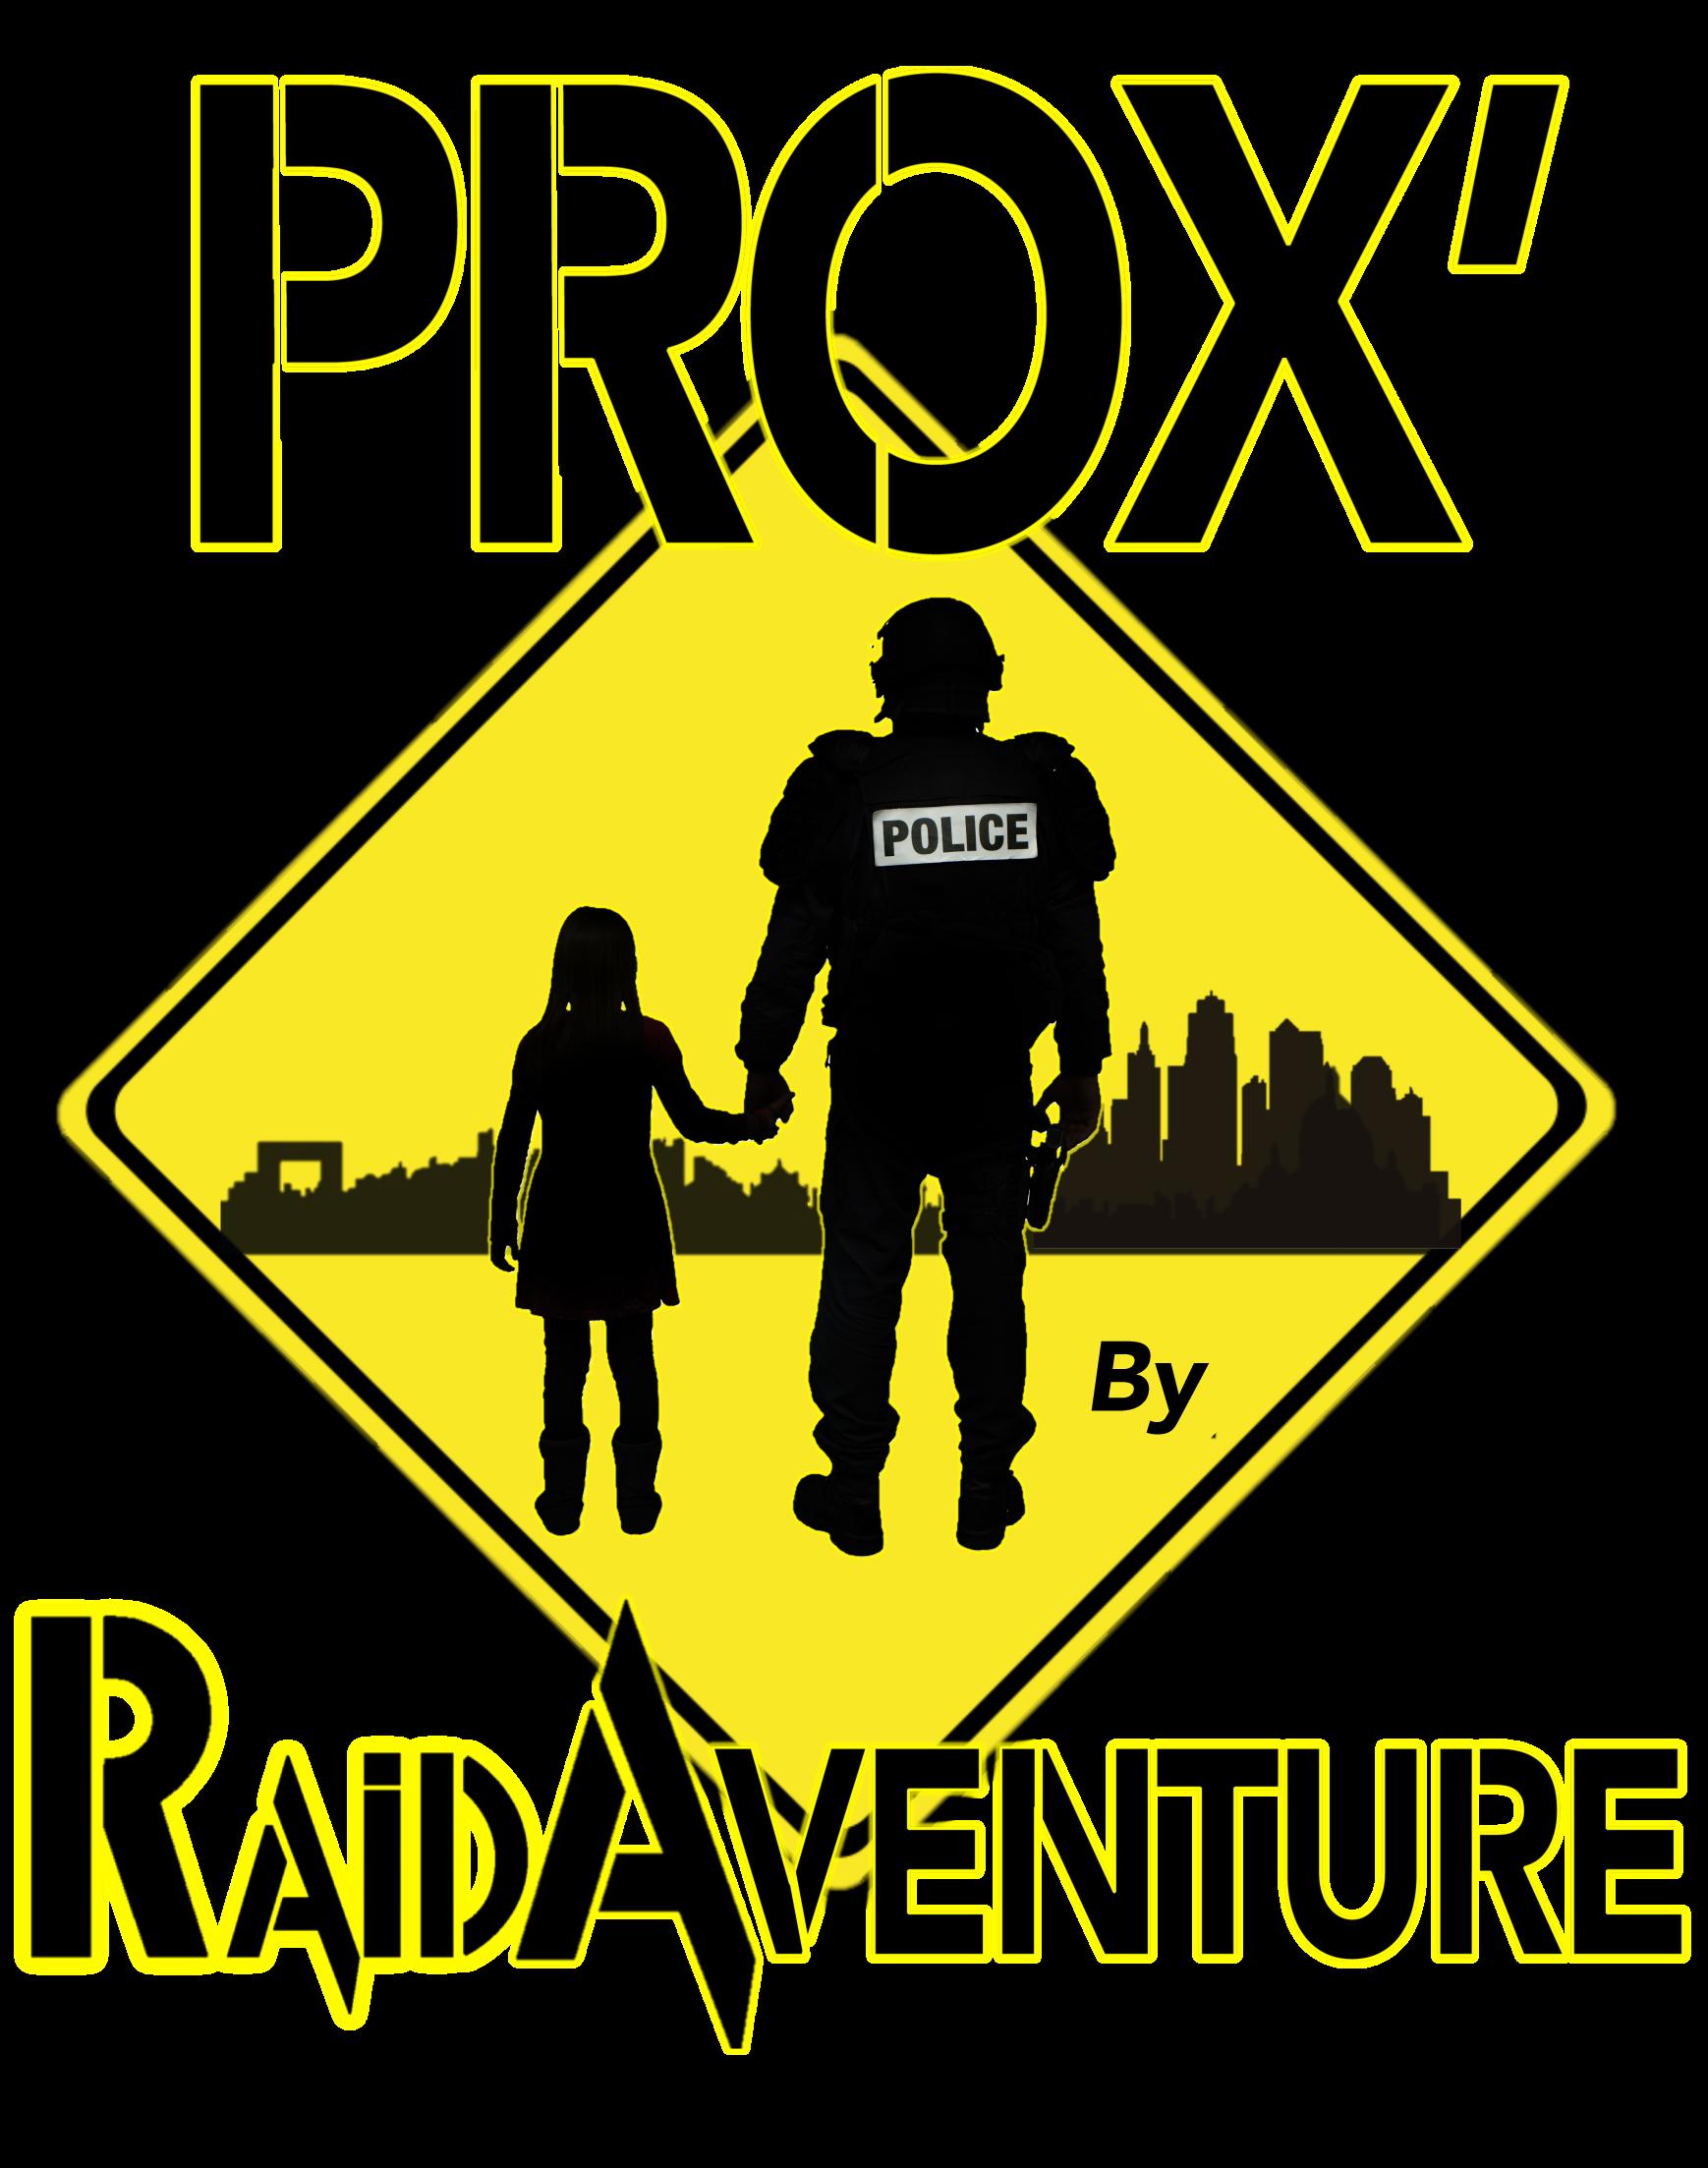 logo prox by raid aventure organisation